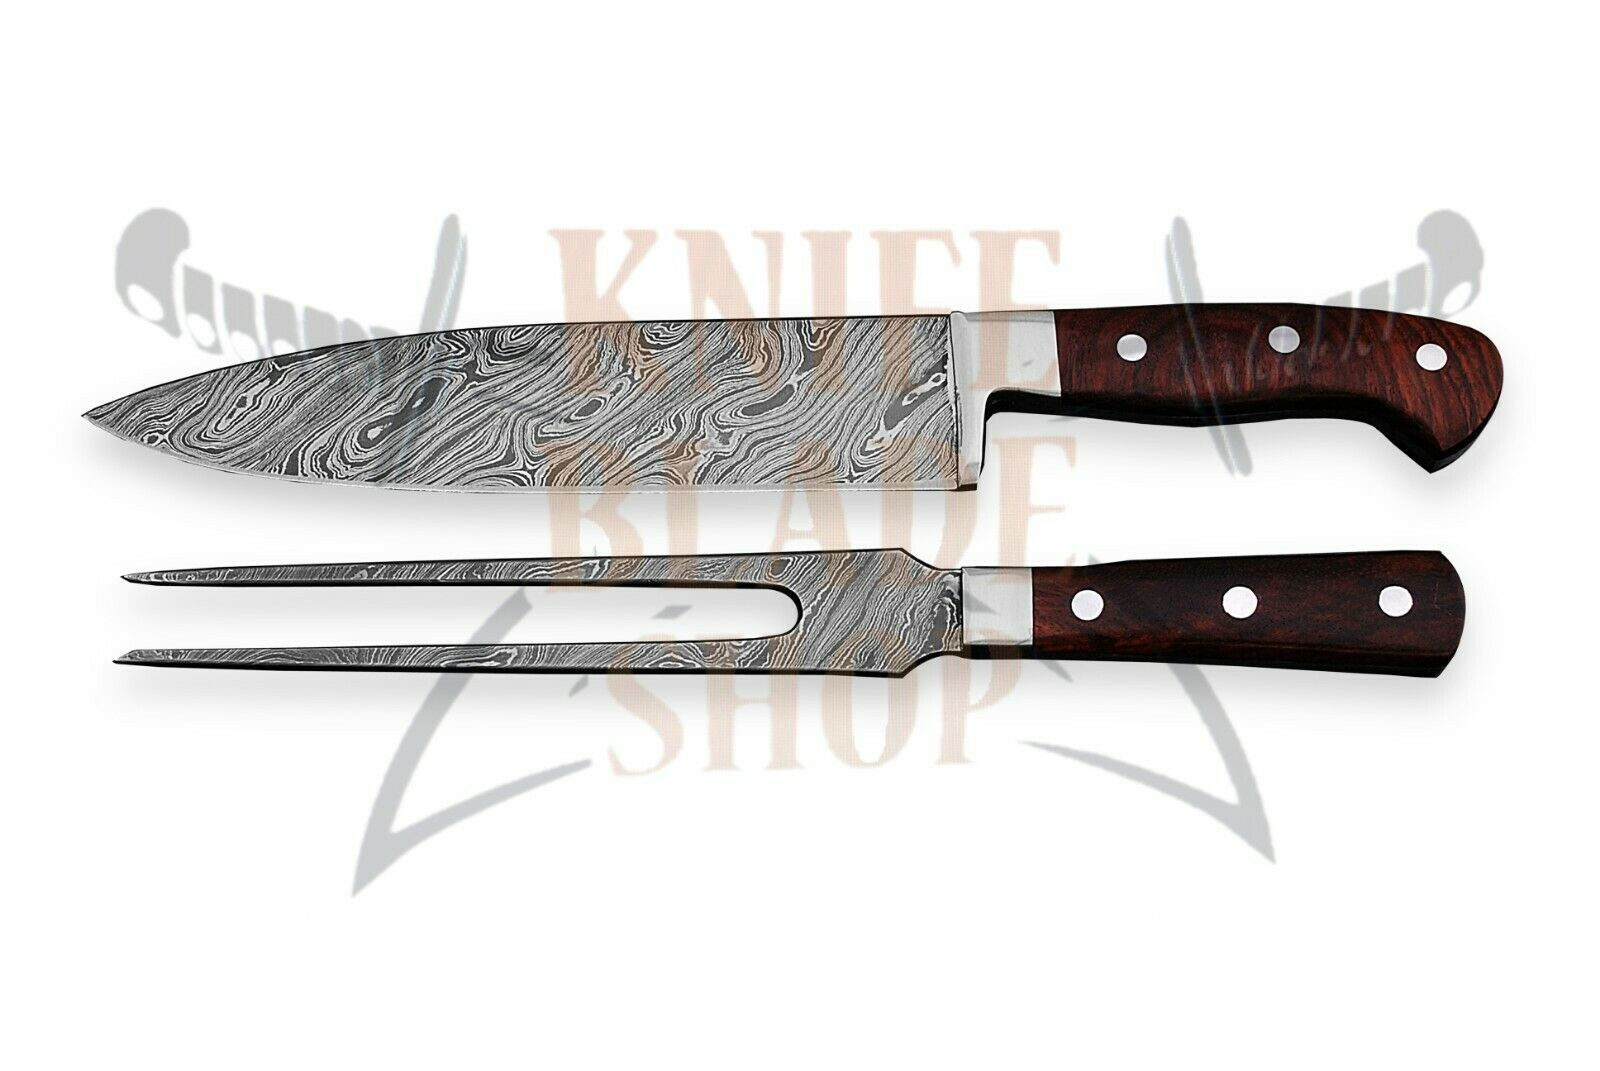 Damascus Steel Blades ,VIKING 2 PIECE PIECE PIECE CARVING  SET     02 piece SET 94b0bc